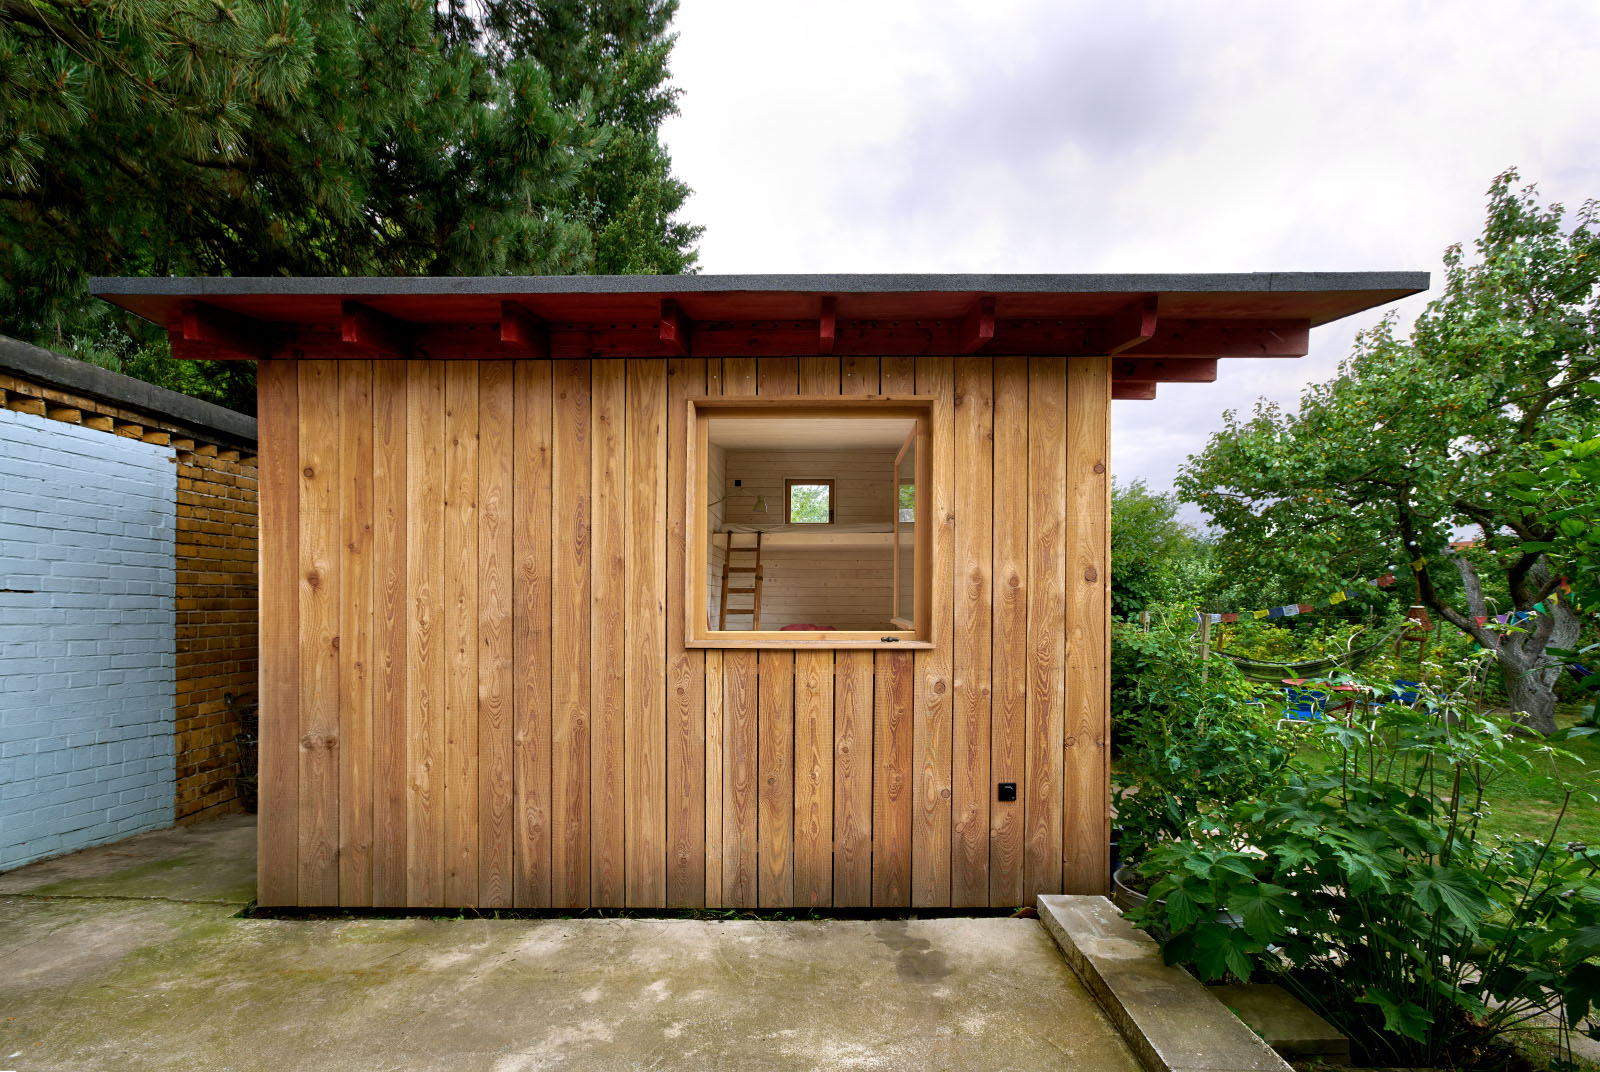 "<a href=""http://www.ko-ok.cc"" target=""_blank"">Gartenhaus an der Tabaksmühle // Fabian Onneken // KO/OK Architektur // www.ko-ok.cc</a>"